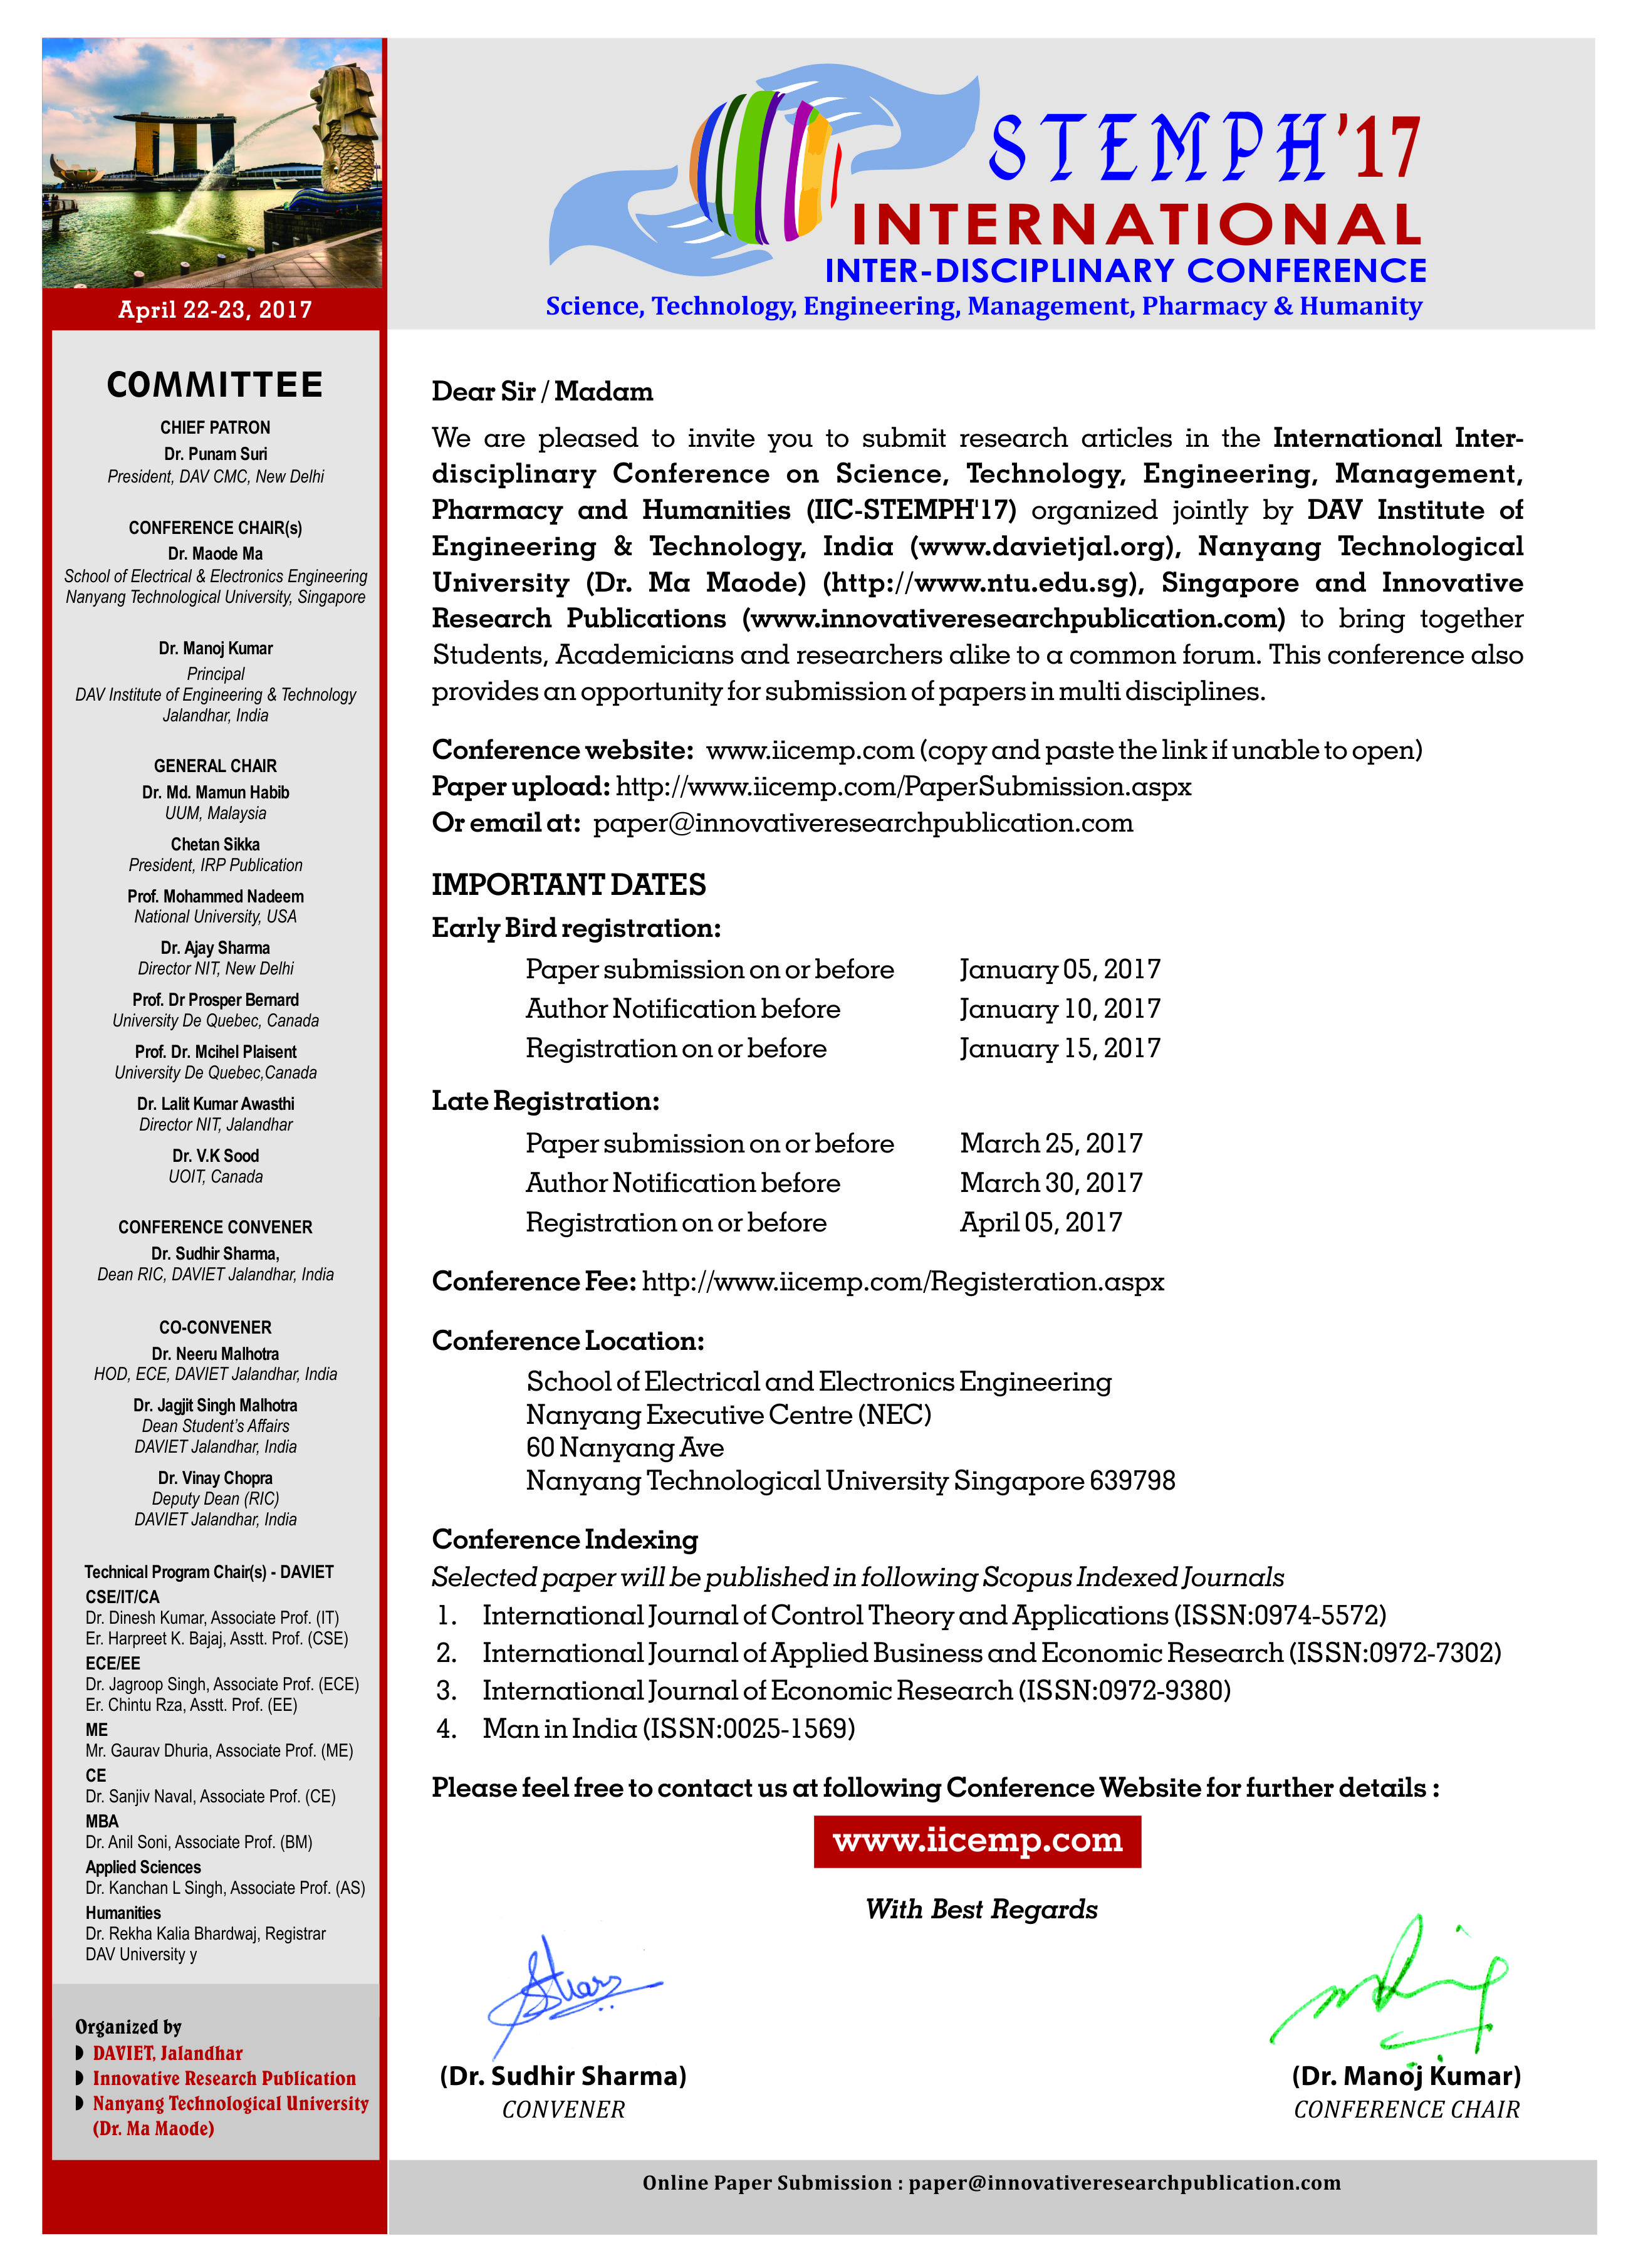 IICSTEMPH 2k17 Invitation Letter DAVIET College